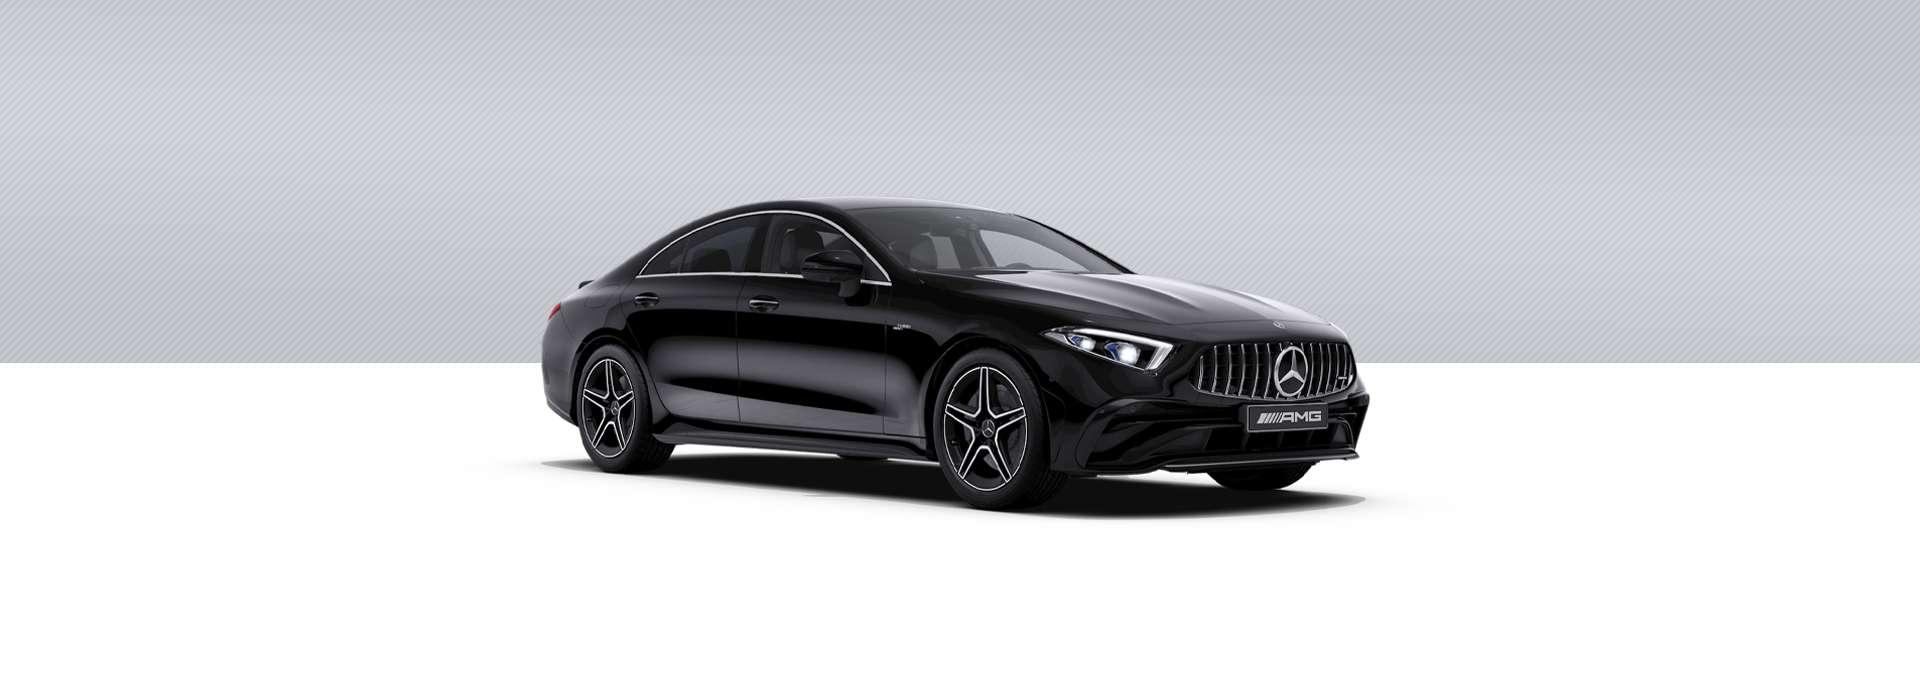 Mercedes Benz NUEVO AMG CLS COUPÉ